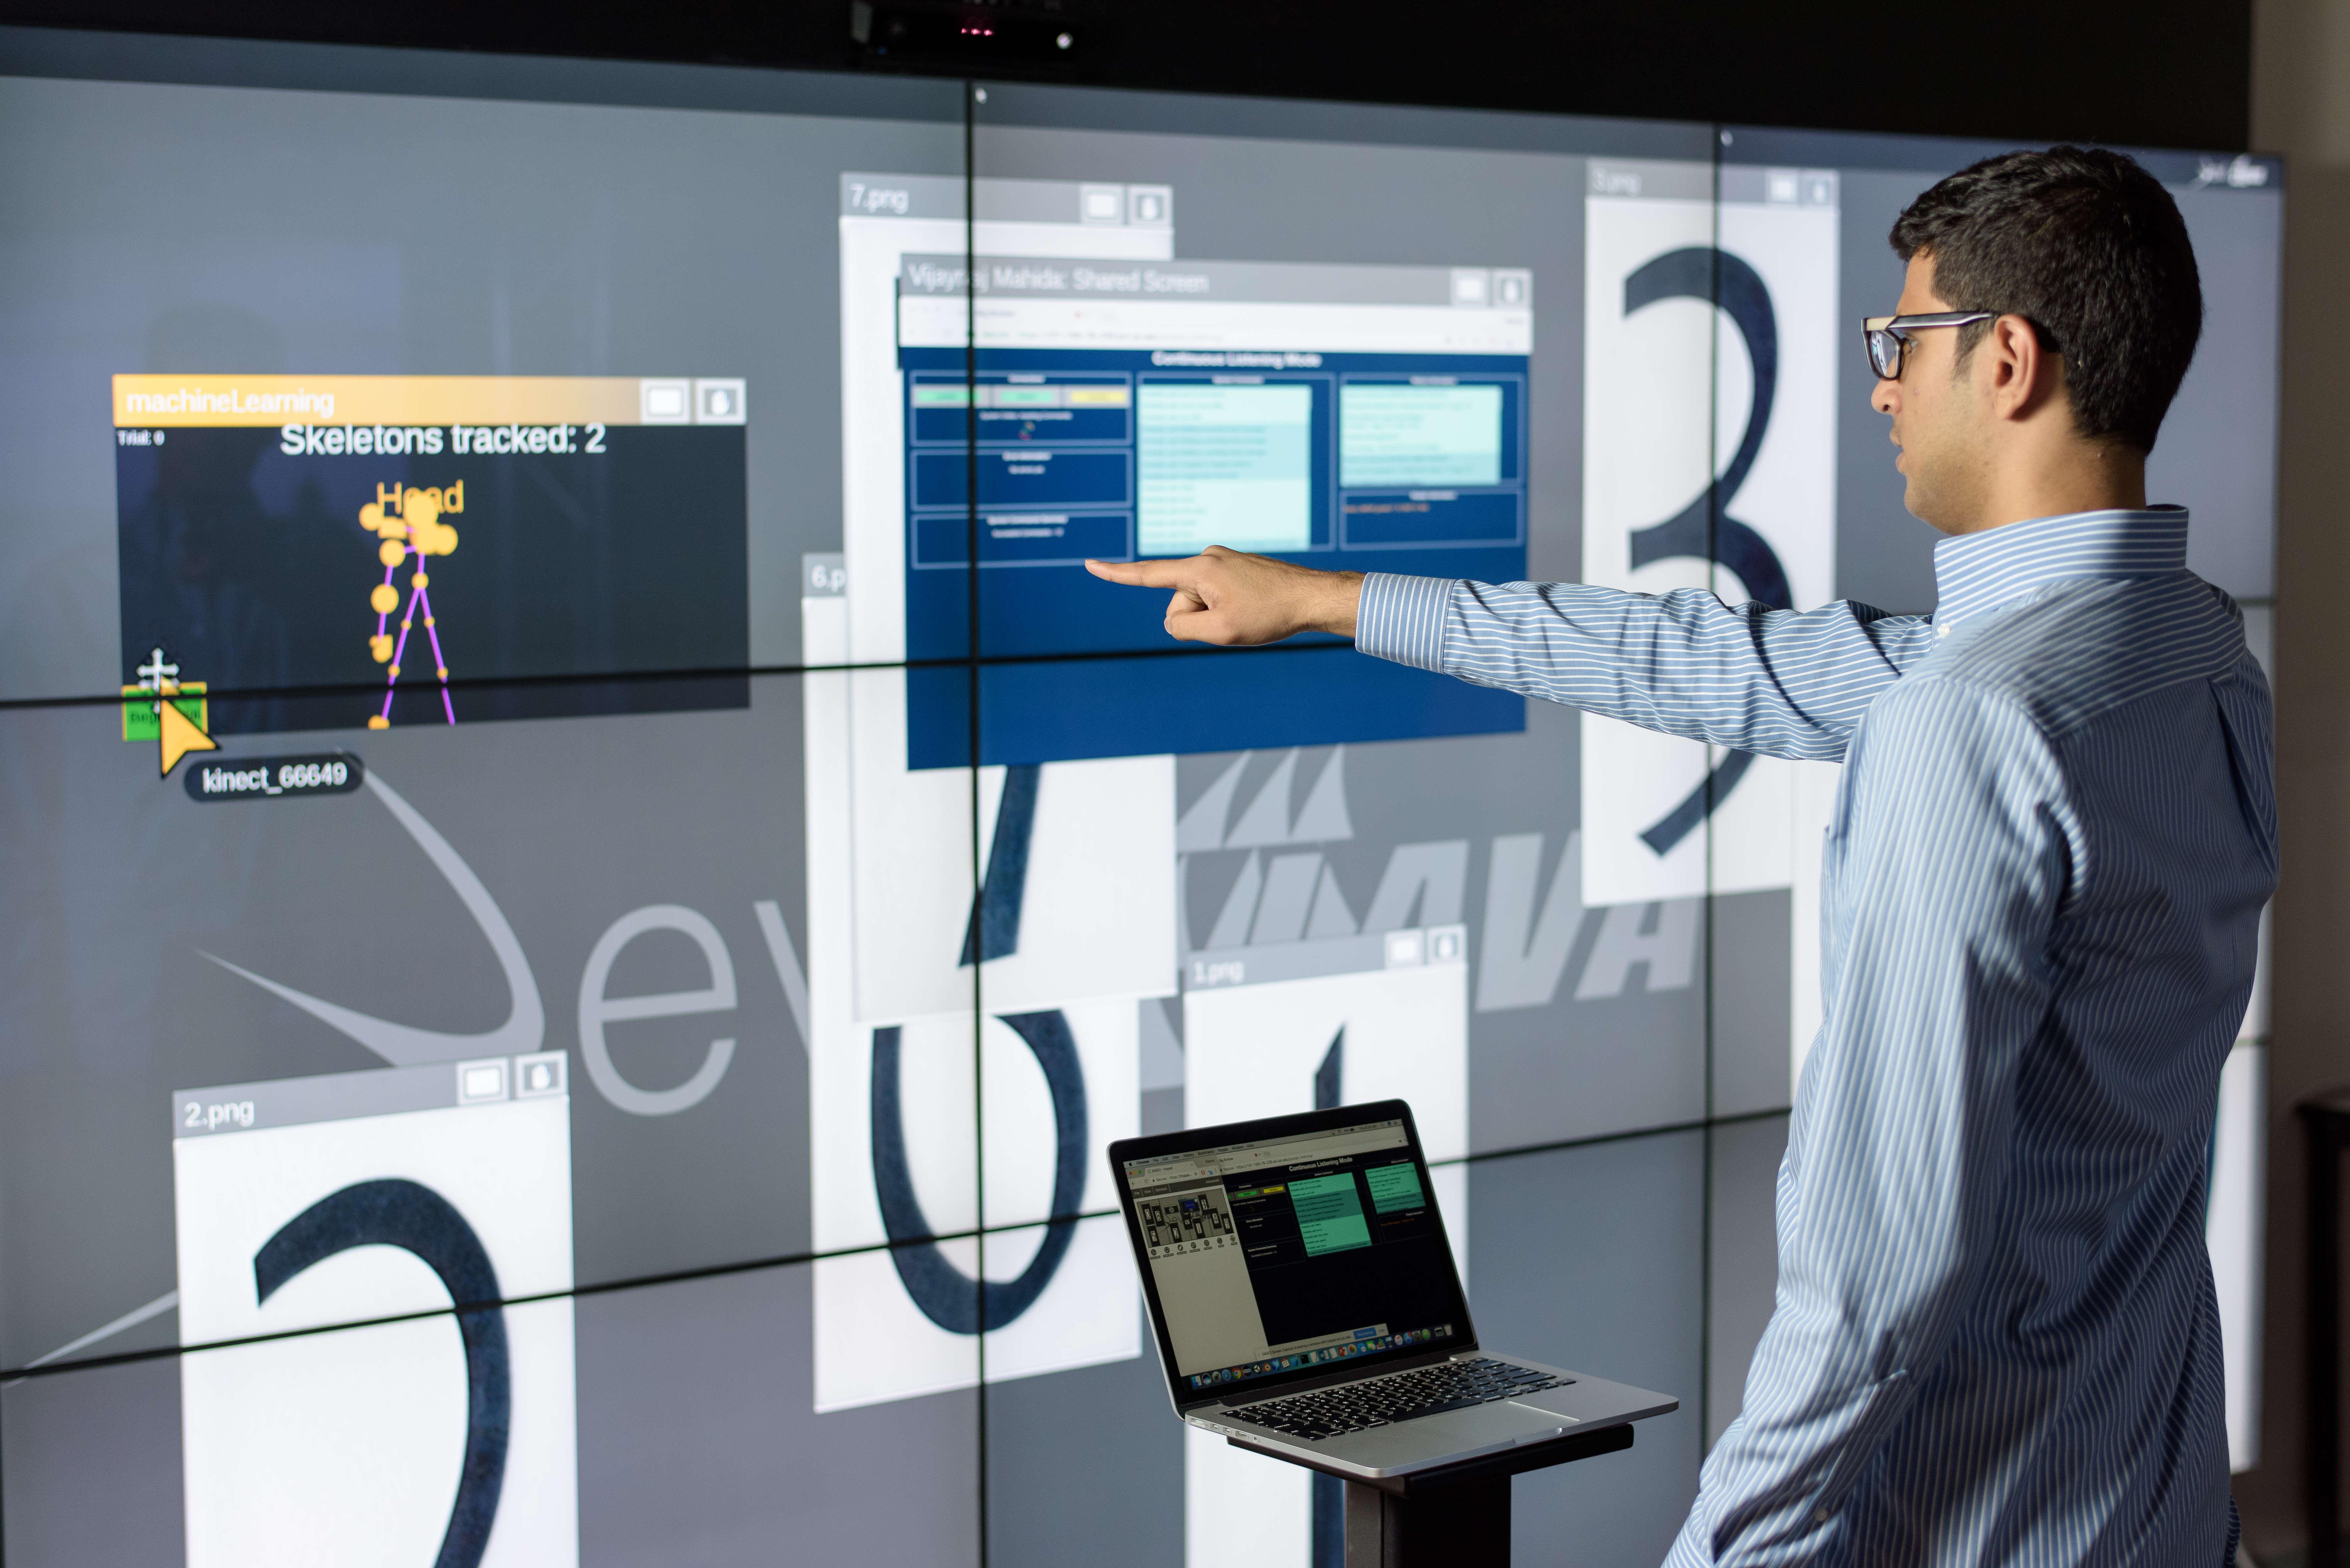 Vijayraj Mahida | Computer Engineer, Maker, Inventor